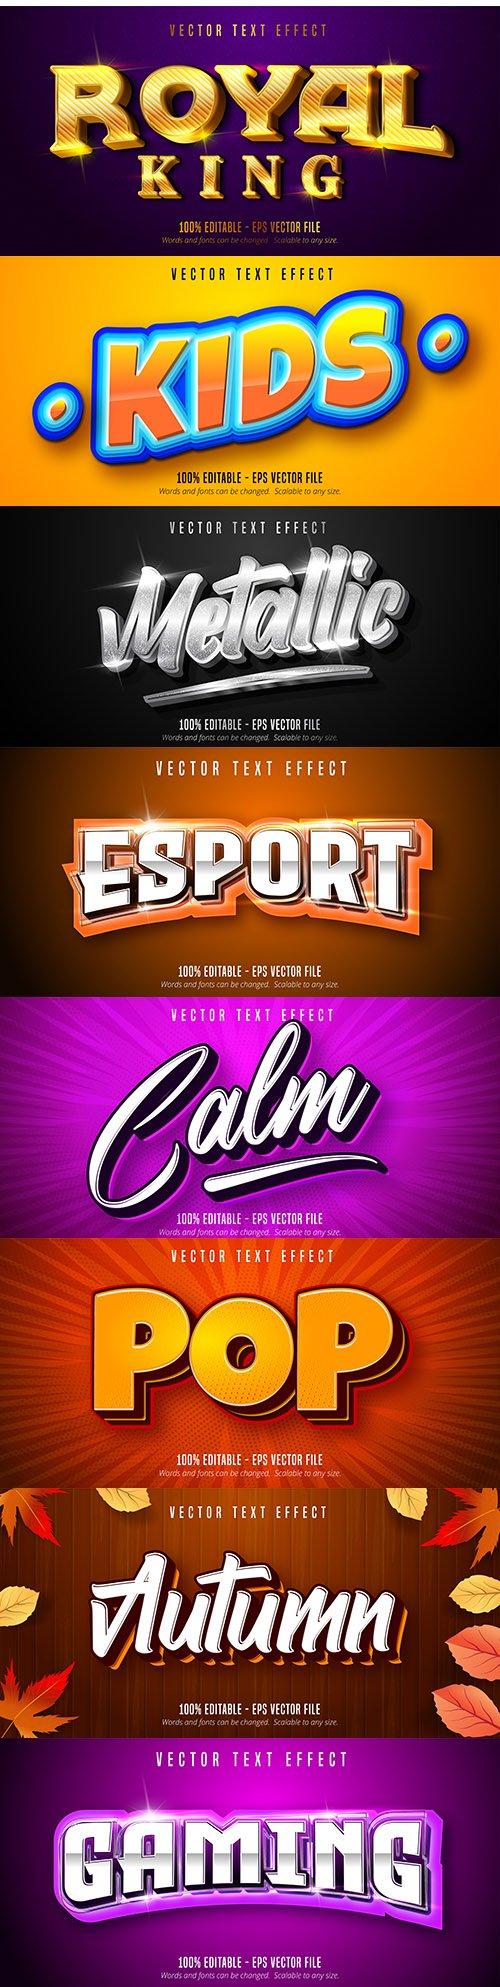 Editable font effect text collection illustration design 178